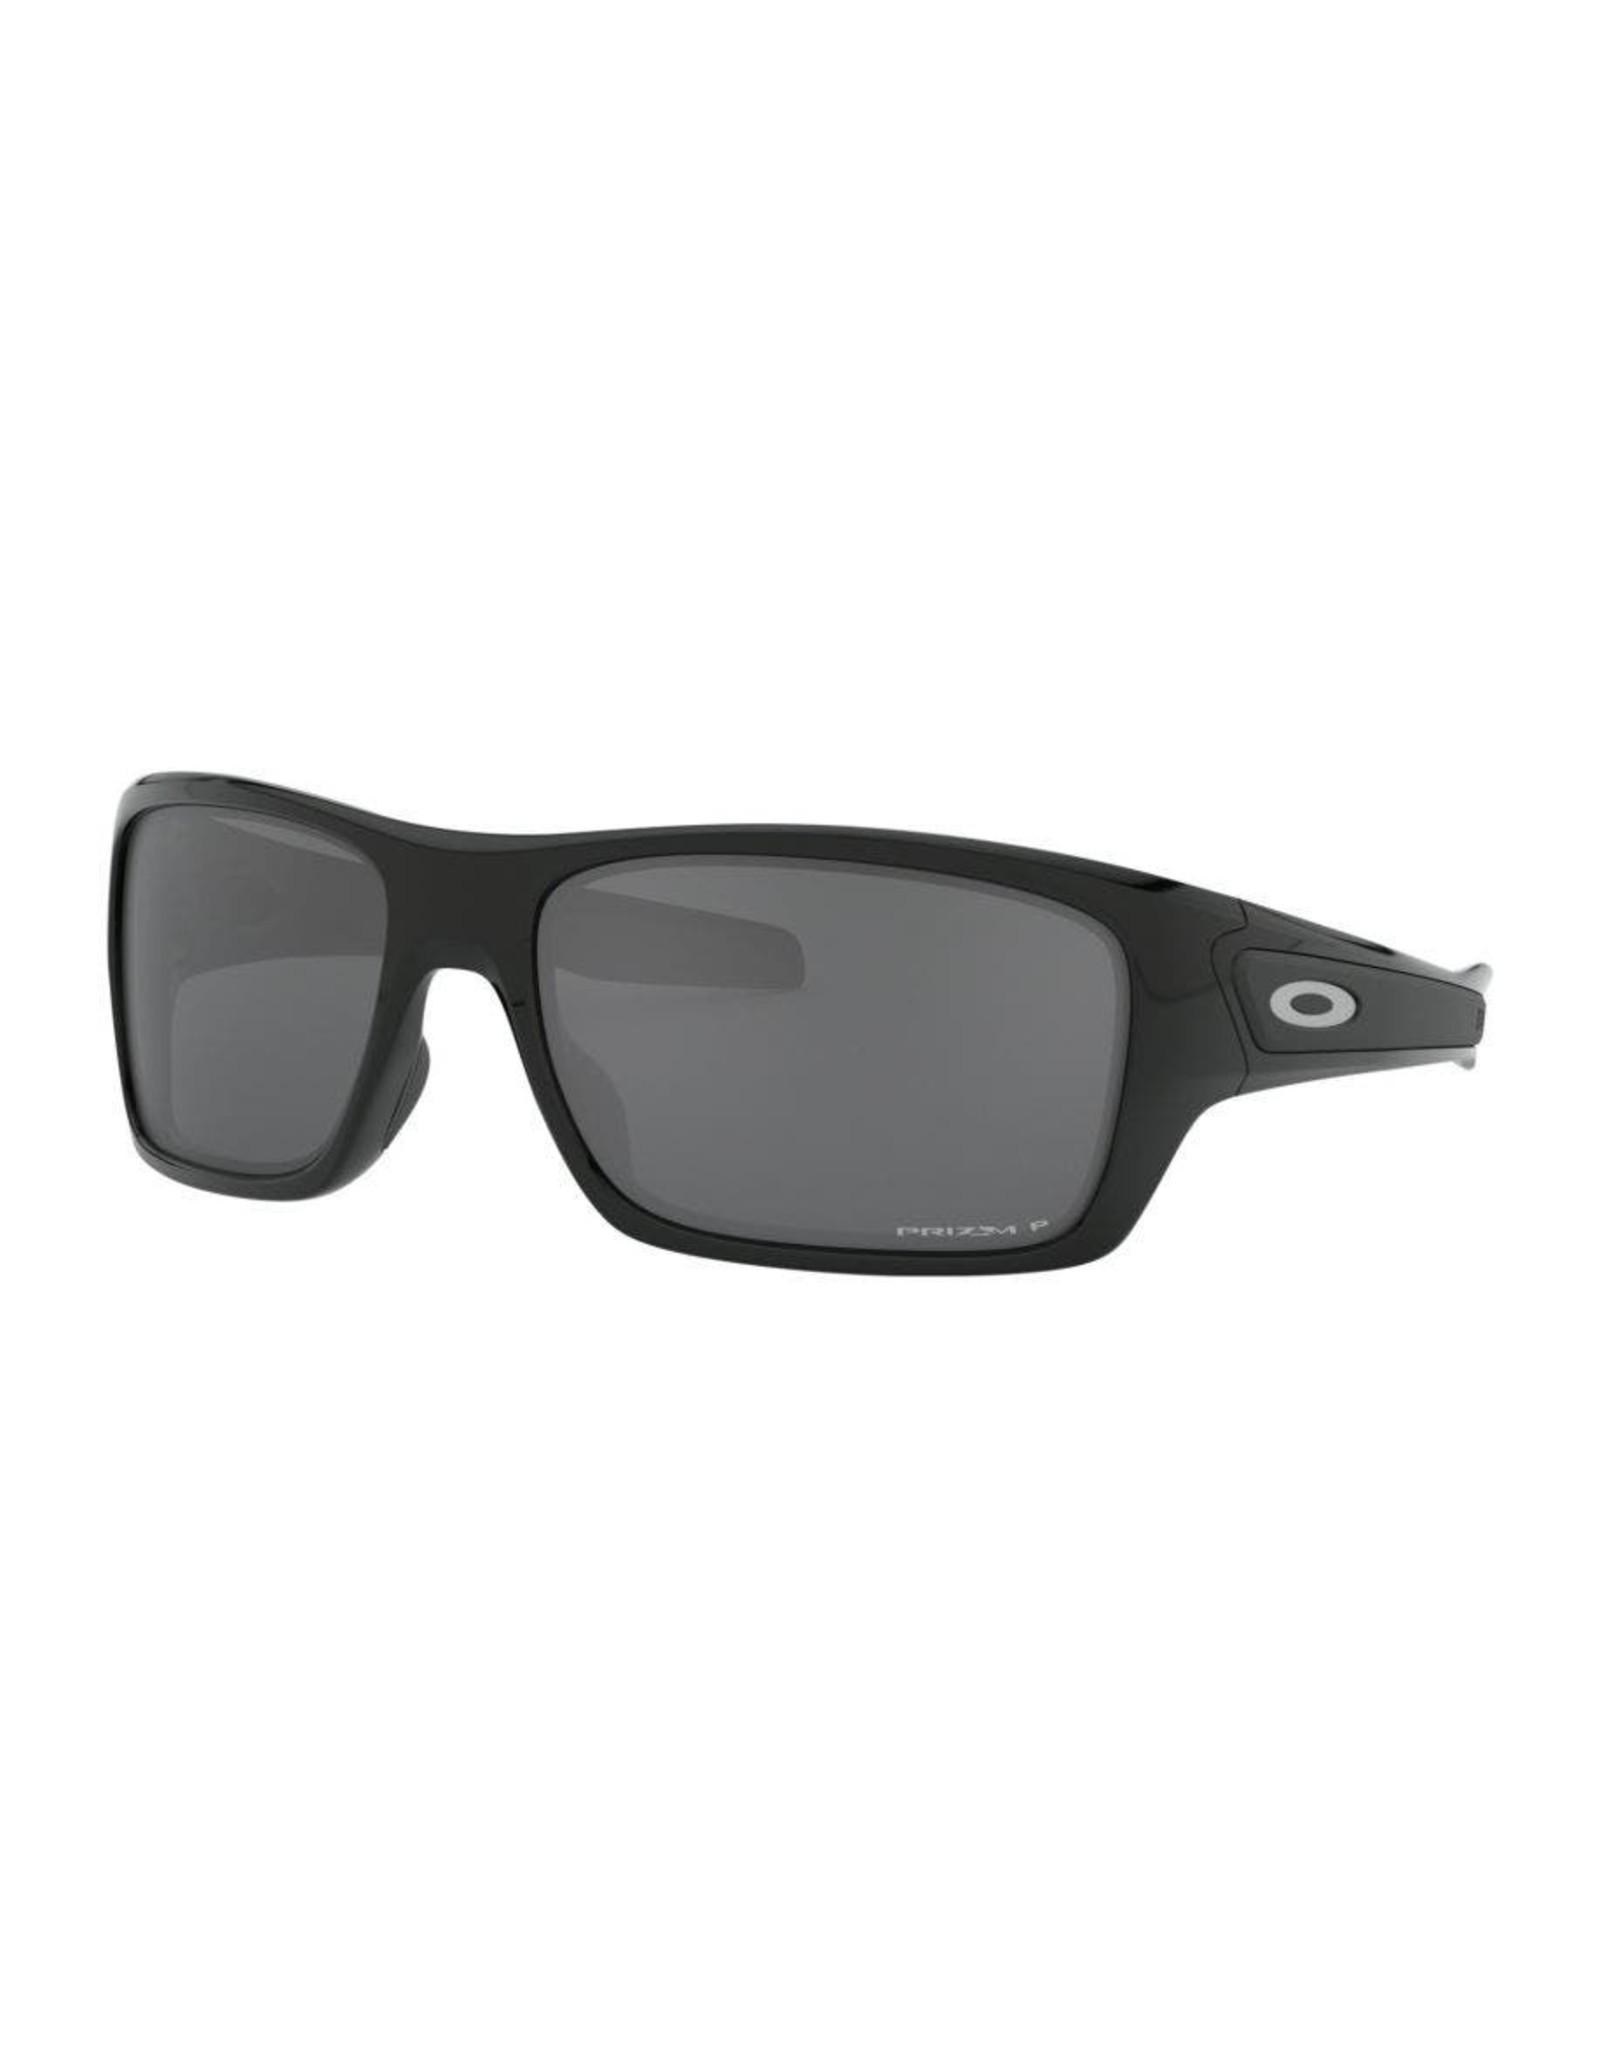 Oakley Mens sunglasses Turbine matte black w/ prizm black iridium